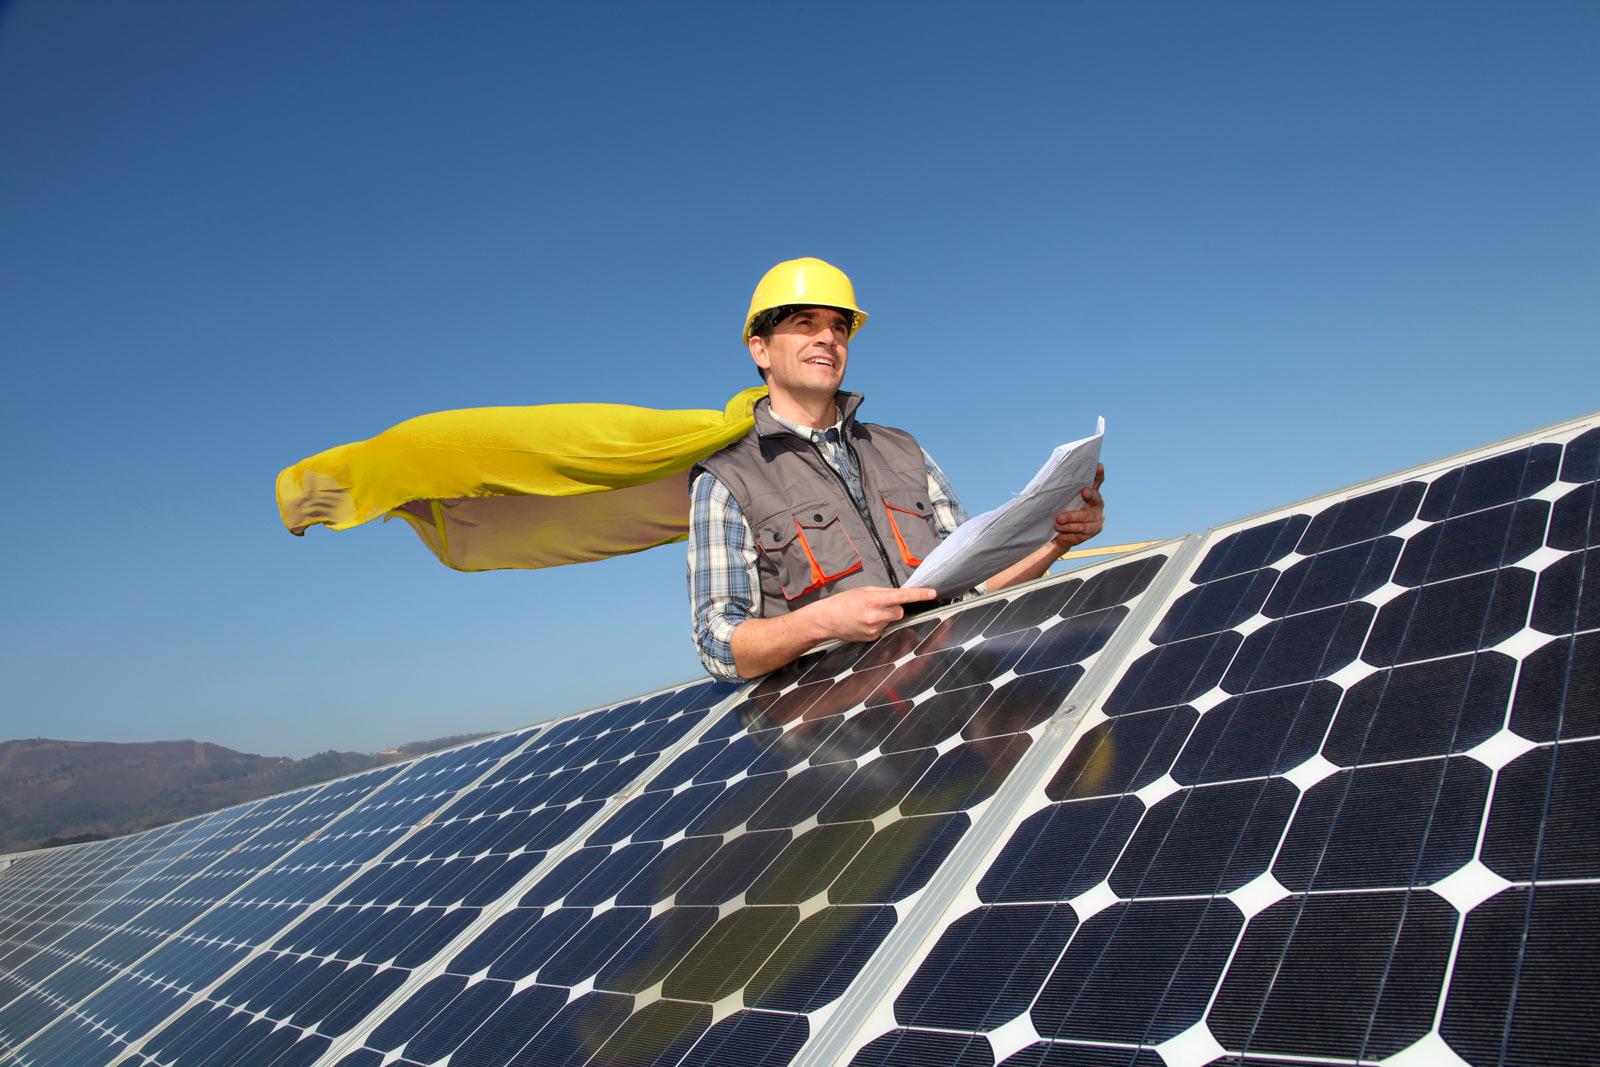 solar installer with a superhero cape